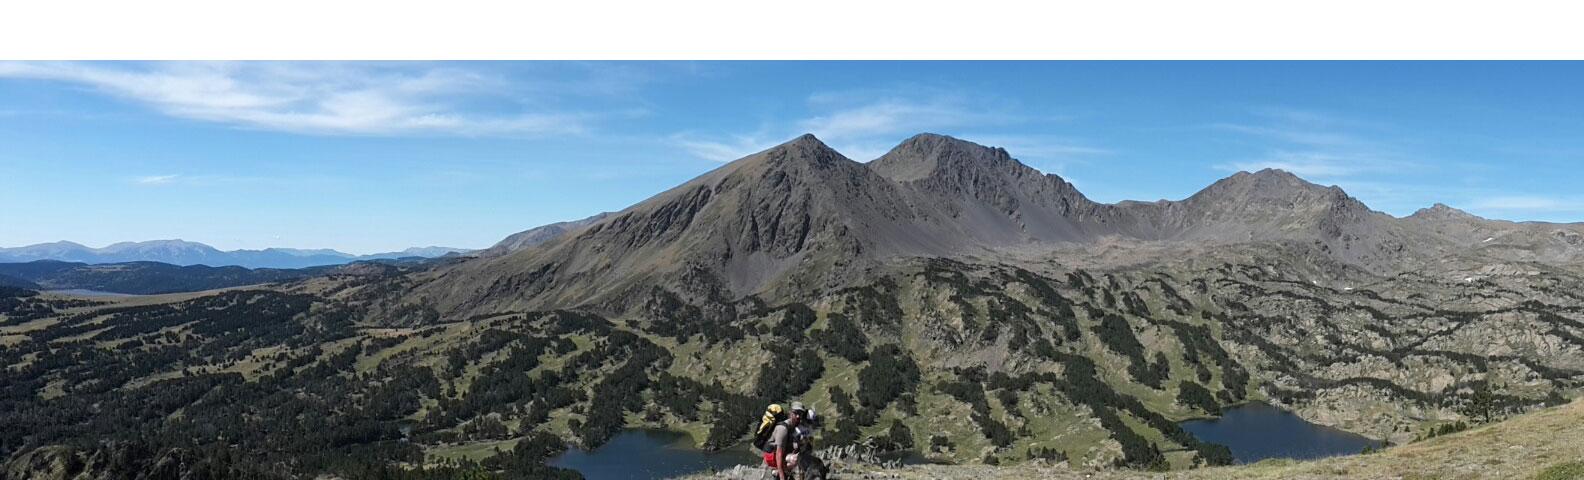 Camping Montagne Blog Pyrénées